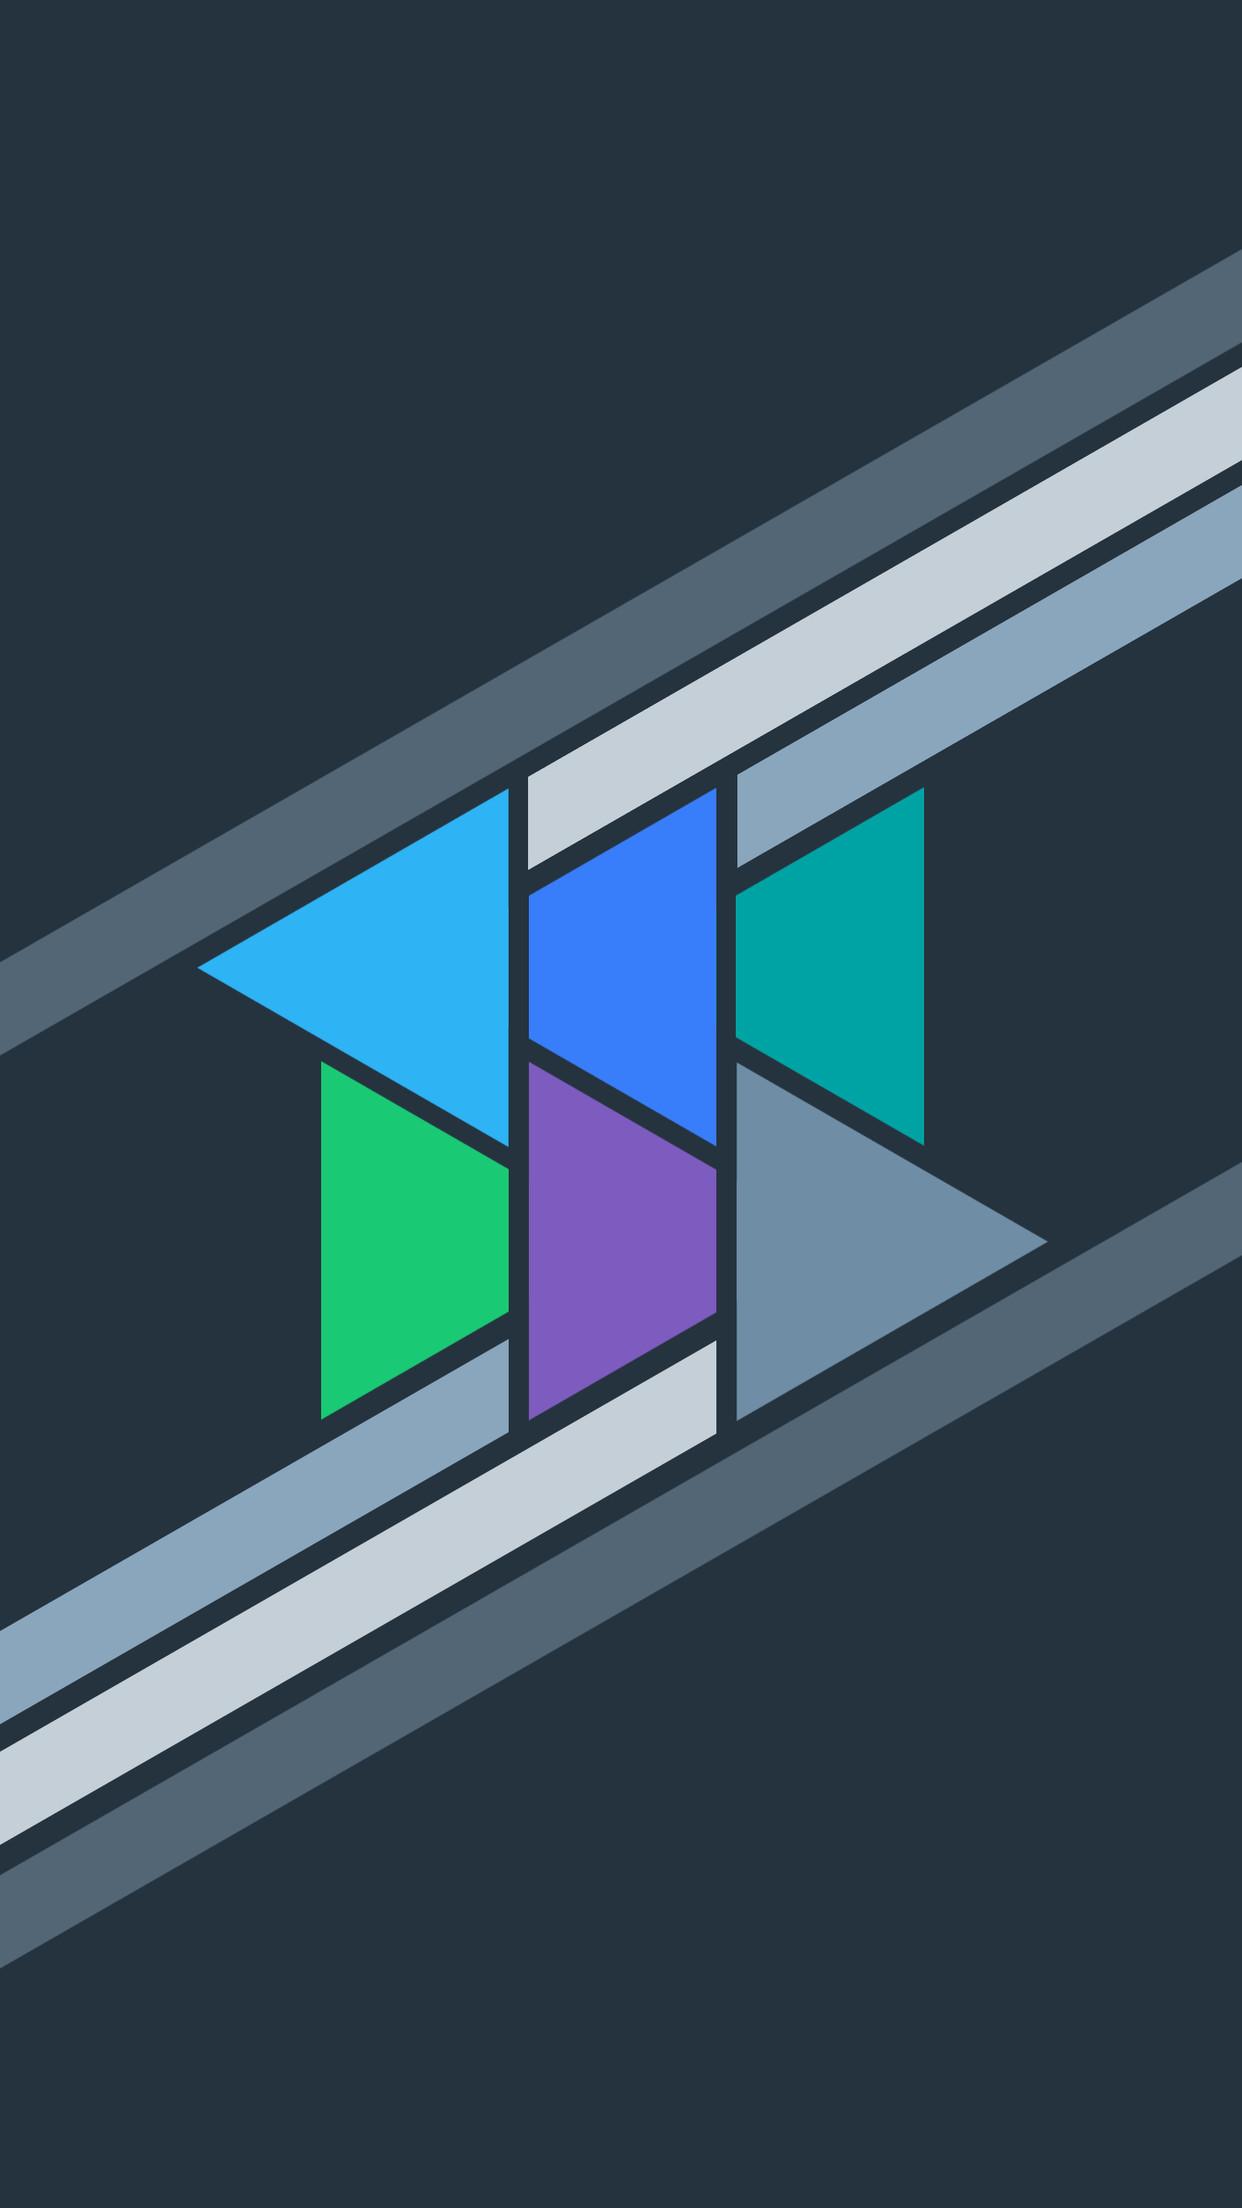 geometry wallpaper kiwimanjaro 3